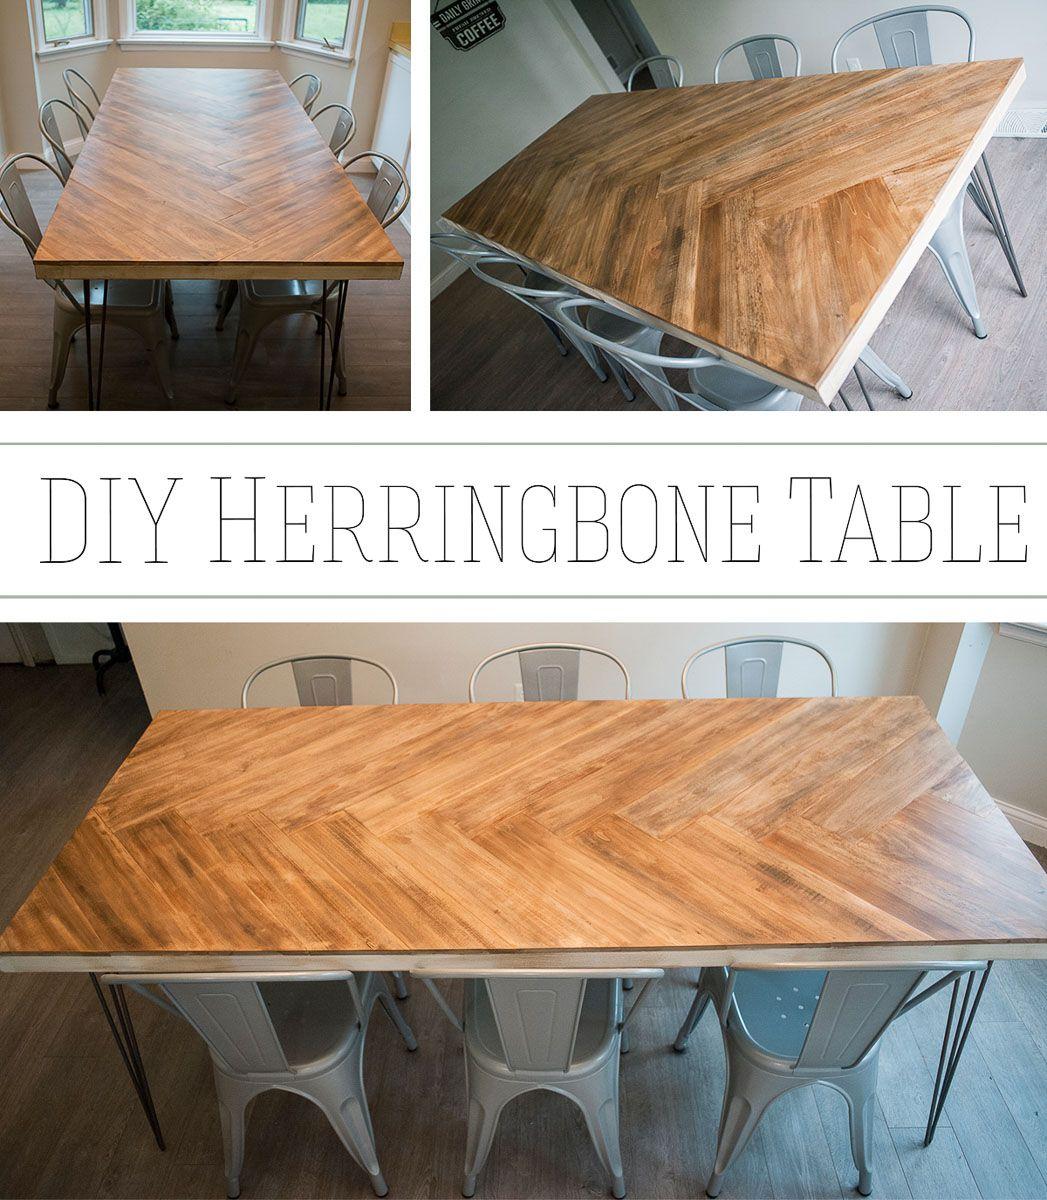 Diy Herringbone Table Part 1 Our Bright Road In 2020 Diy Kitchen Table Wooden Table Diy Diy Dining Table